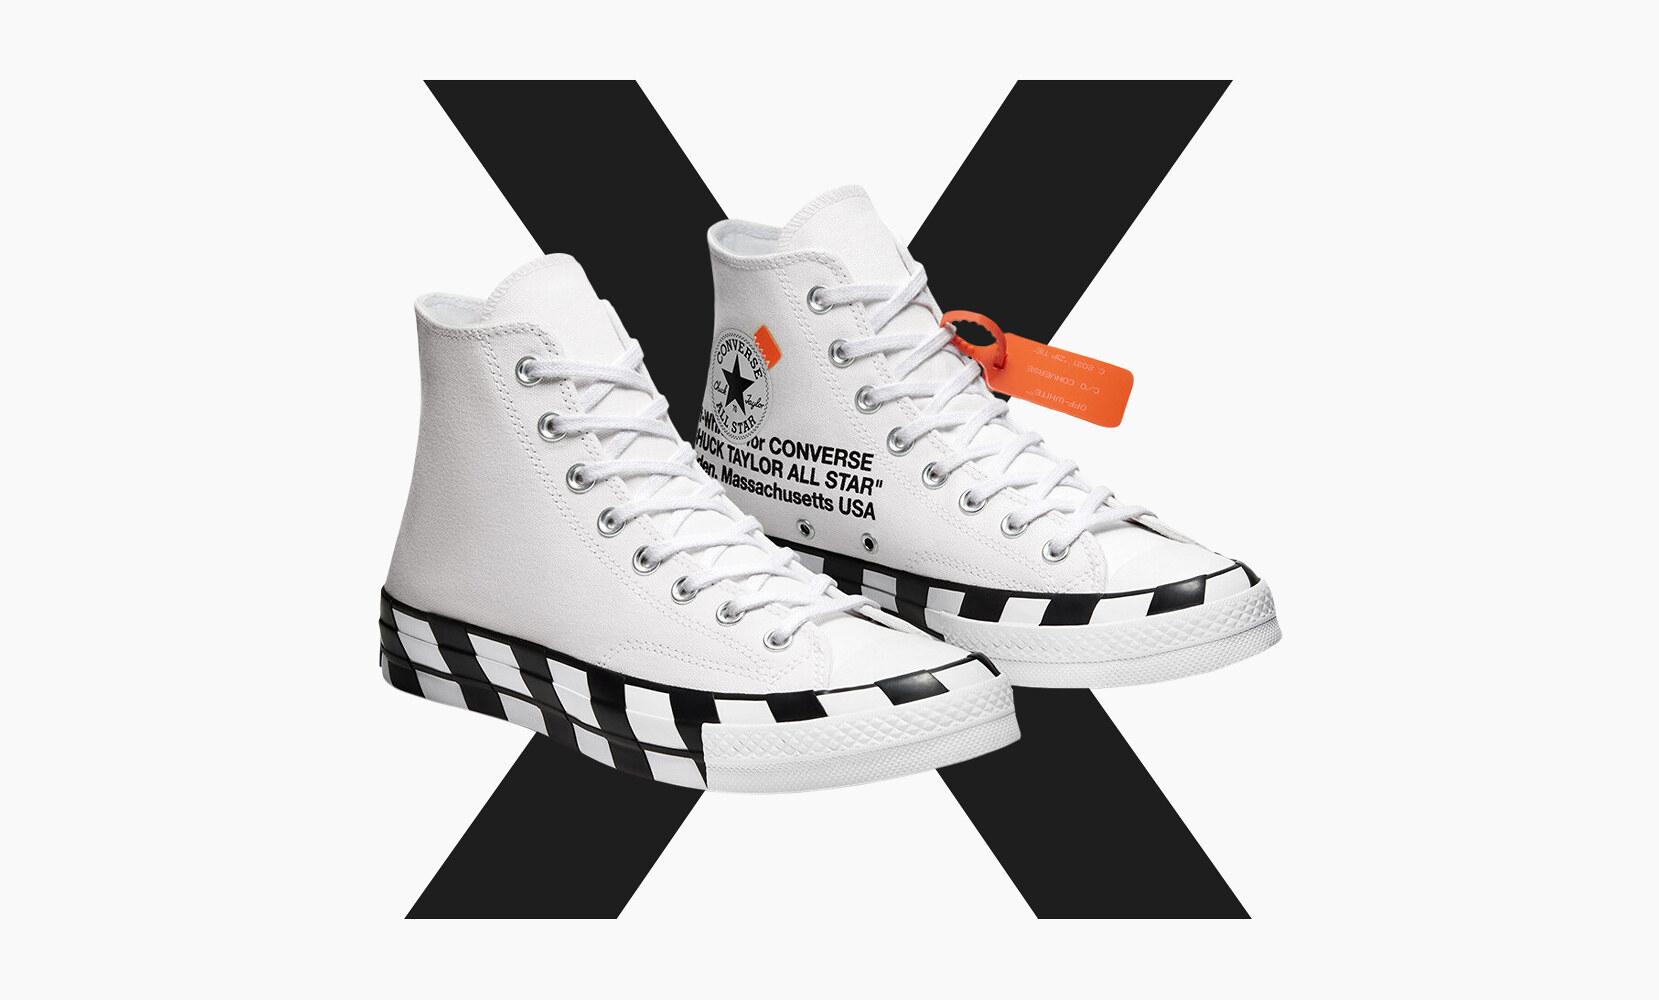 Off-White x Converse Chuck 70 Postponed